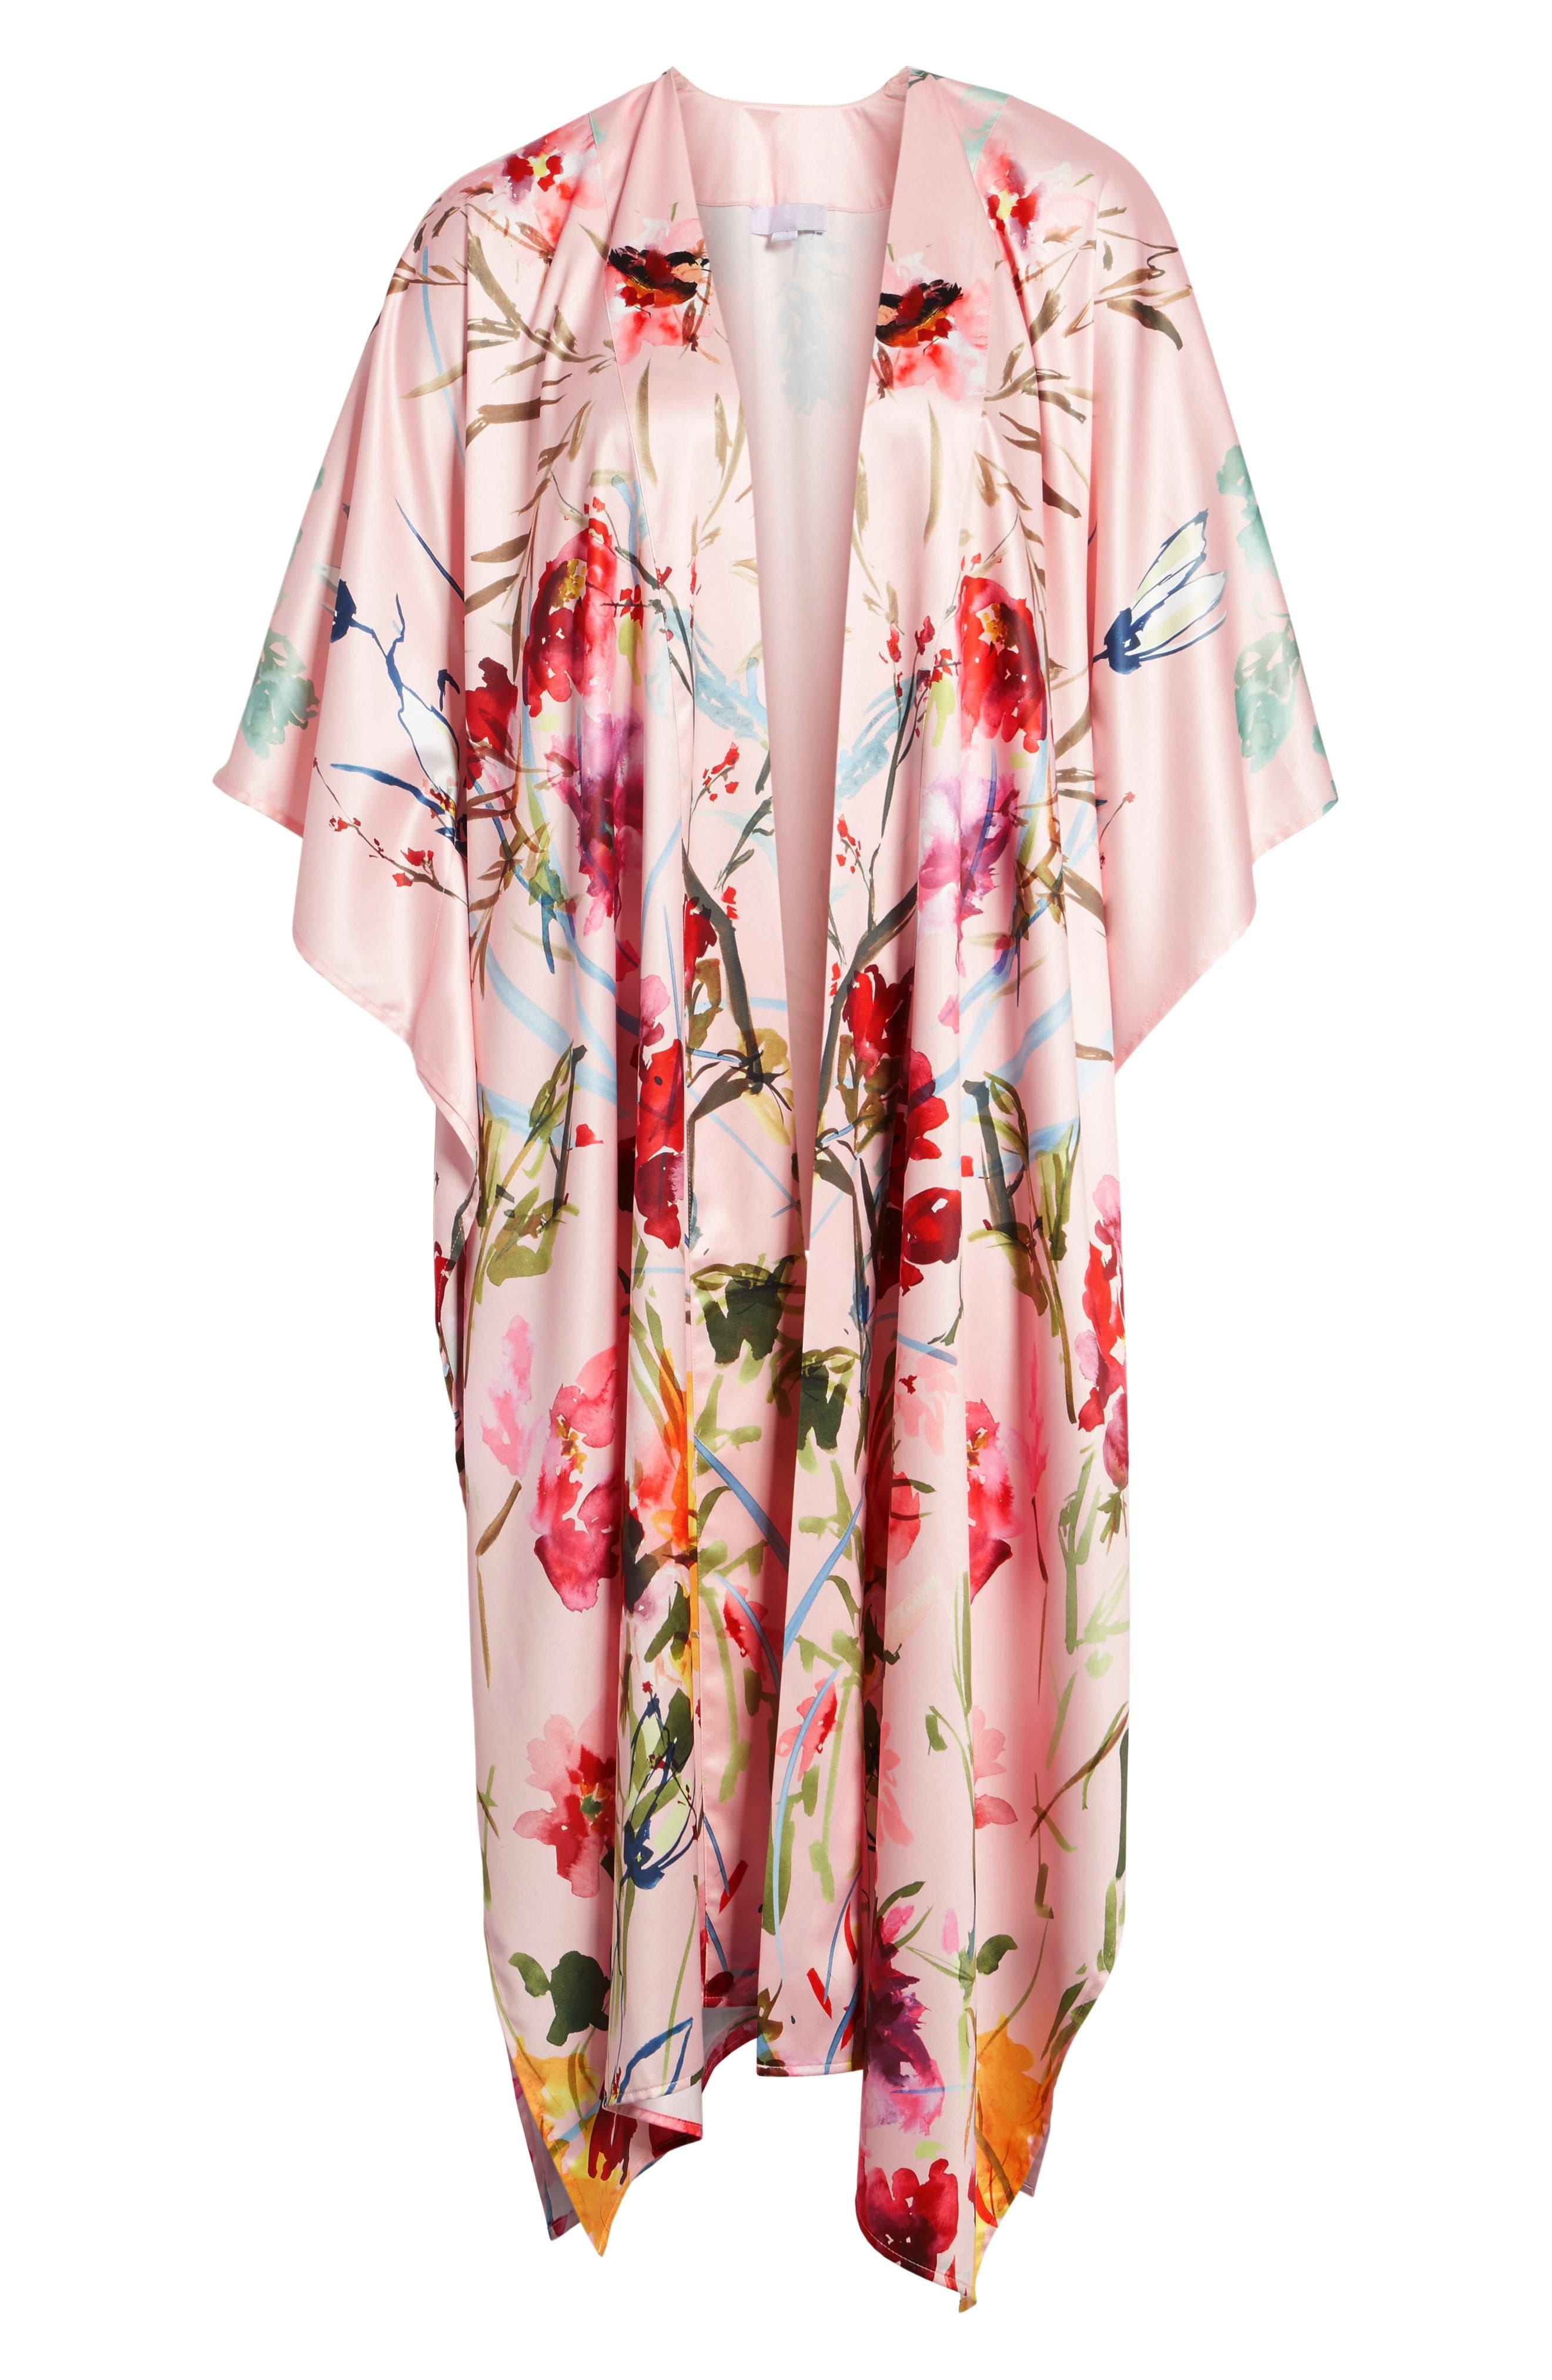 Floral Kimono,                             Alternate thumbnail 6, color,                             Pink Fantasy Garden Print